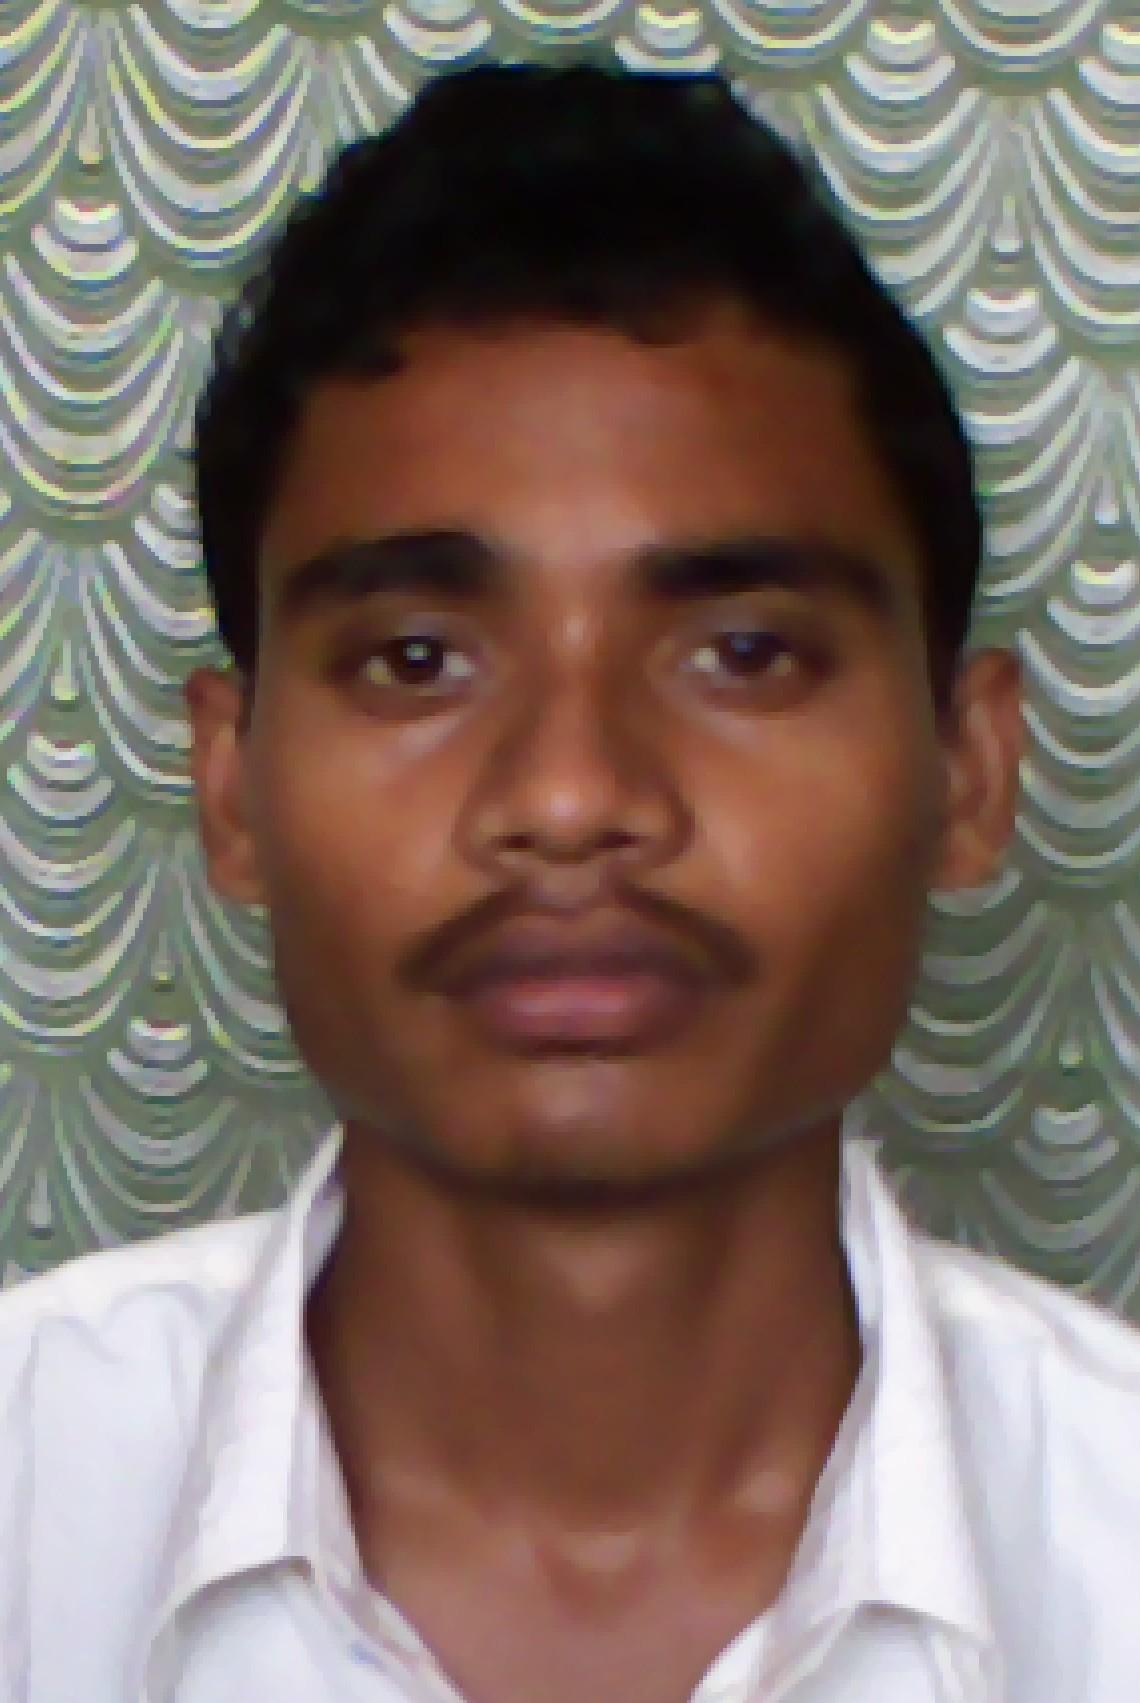 DEBDAS BHATTACHARYYA